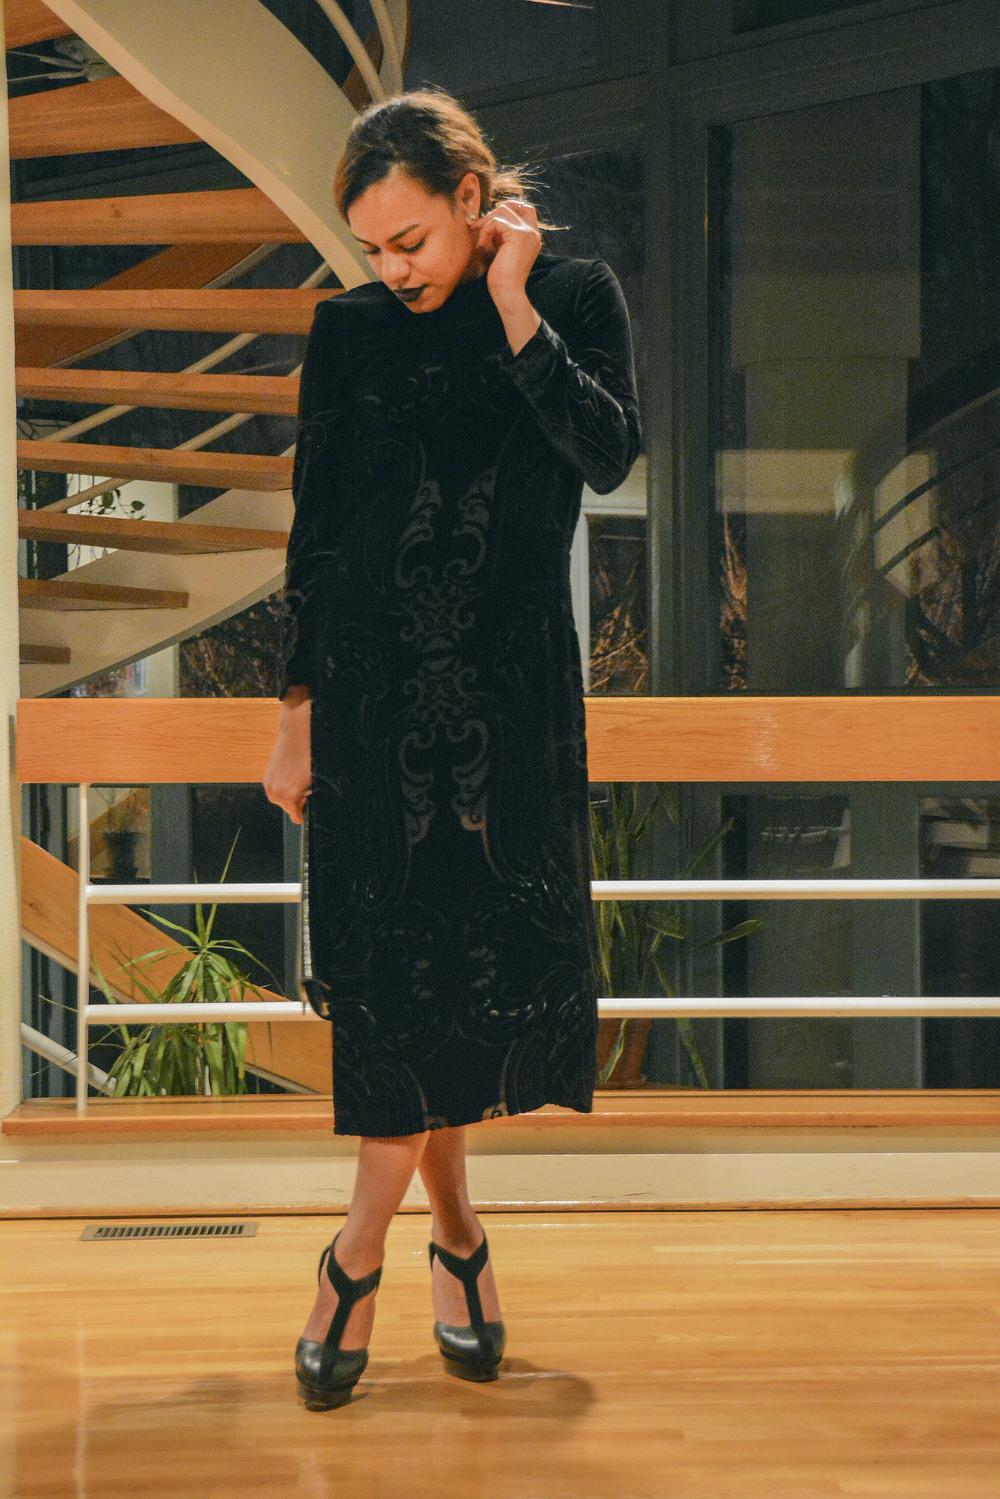 wearing: ZARA dress, YSL shoes & clutch